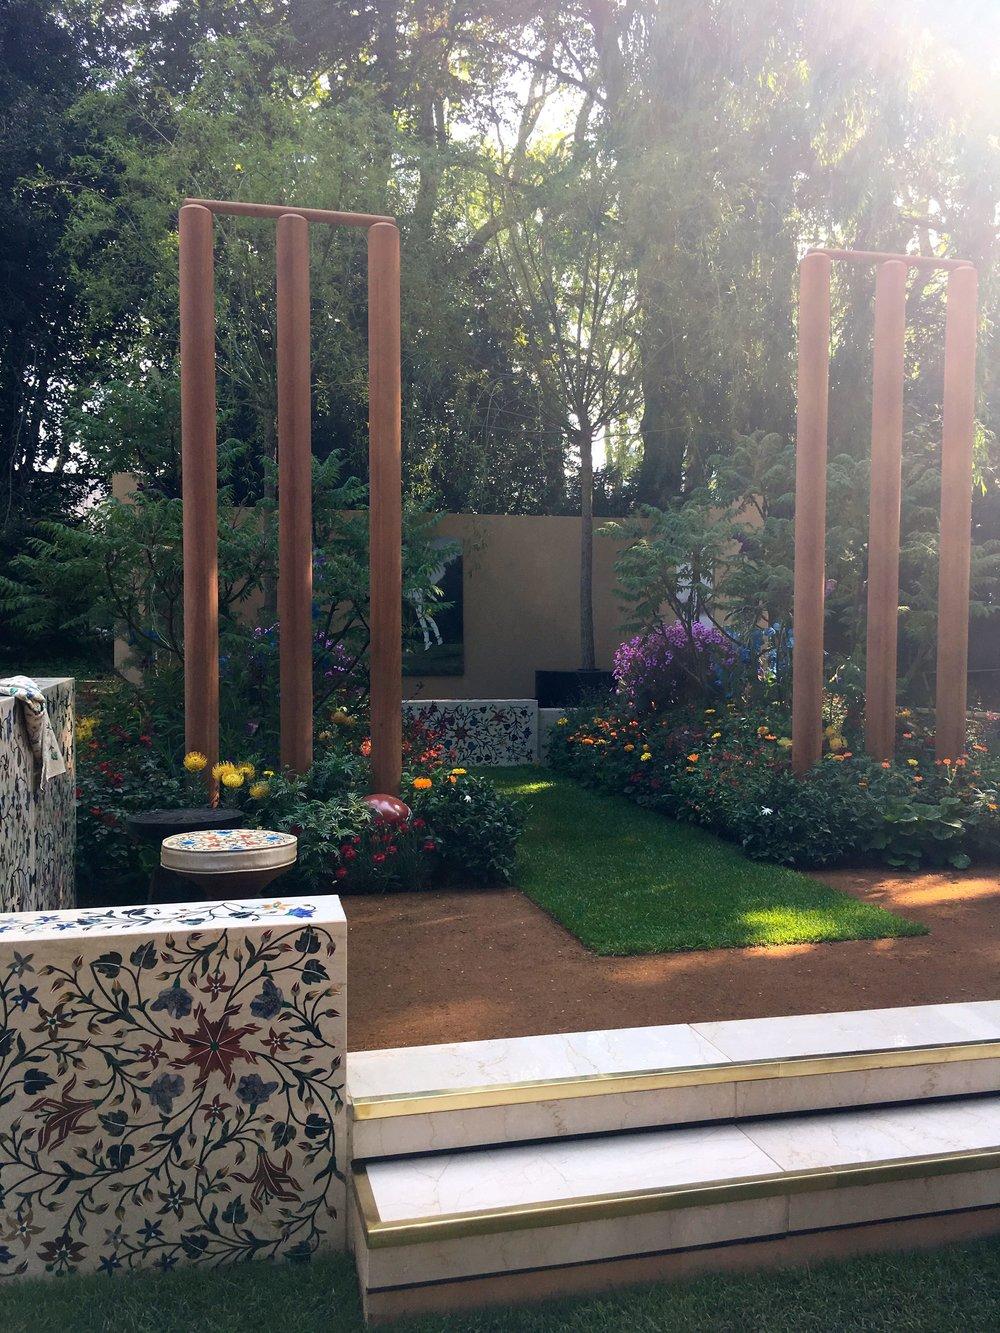 giant cricket stumps in this Chelsea Flower show artisan garden